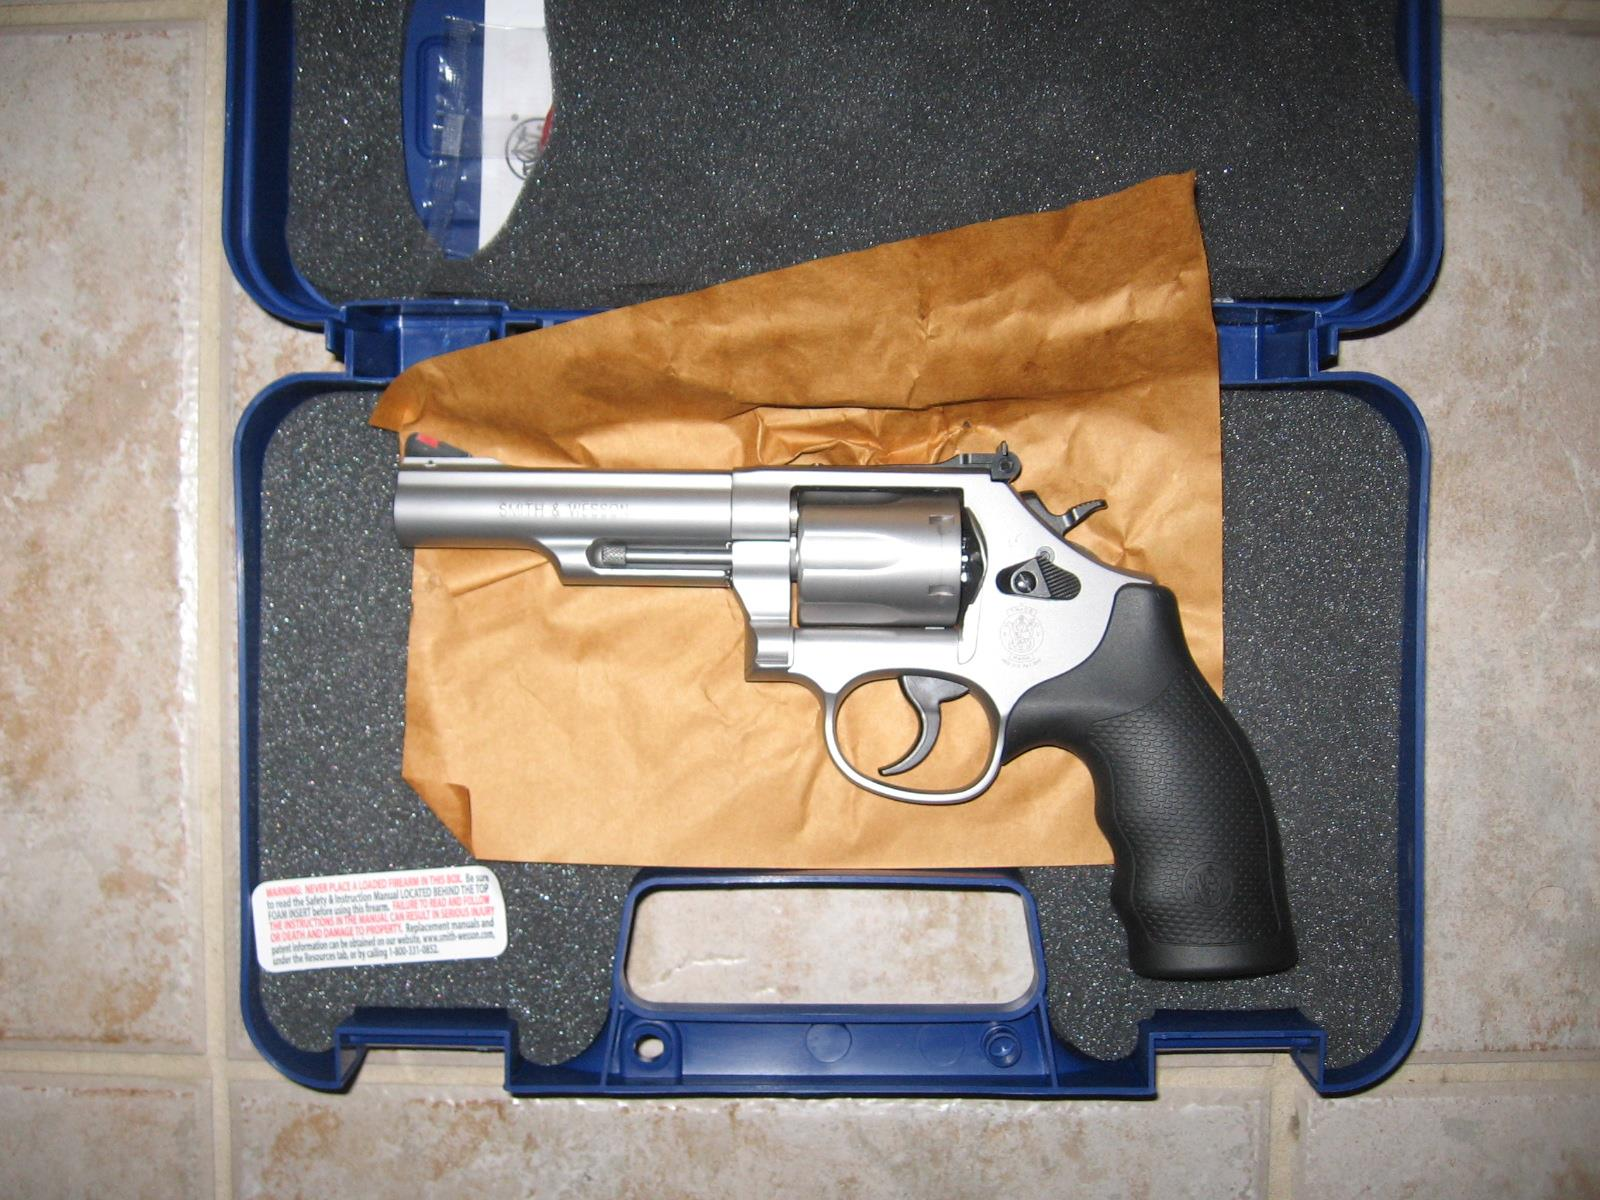 S&W Model 66  Guns > Pistols > Smith & Wesson Revolvers > Full Frame Revolver